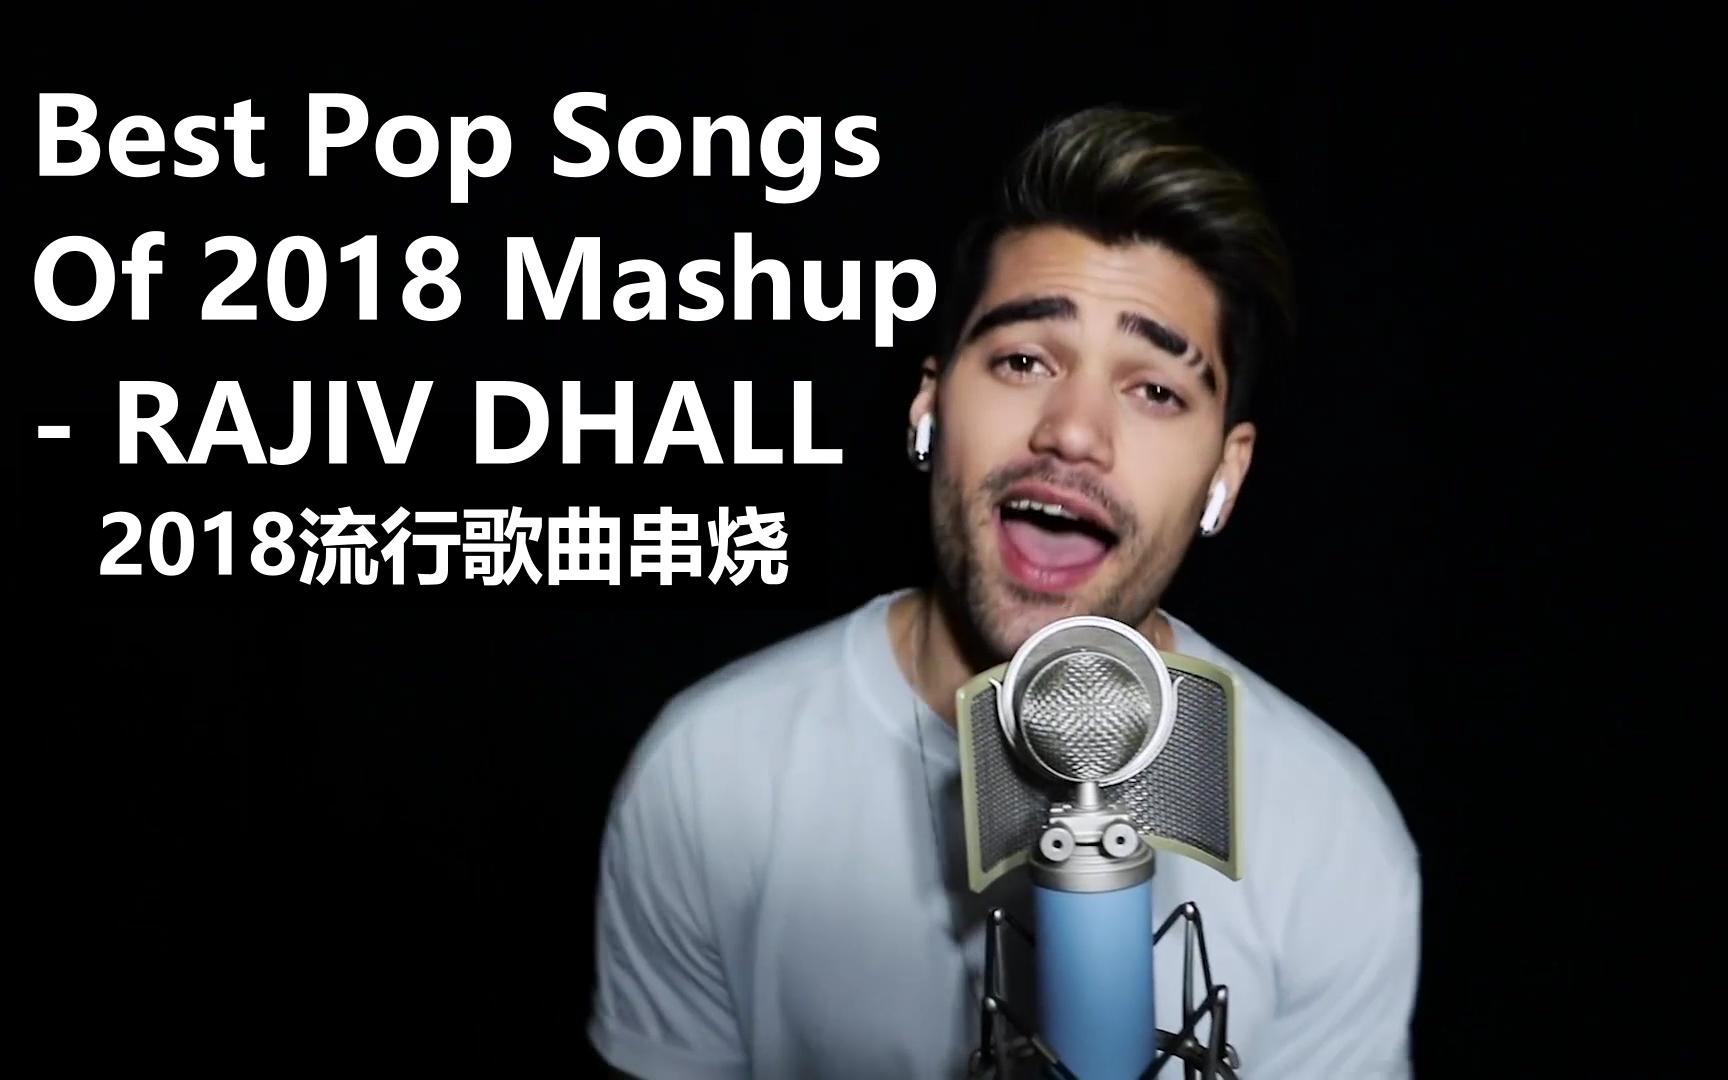 【1080P/中英字幕】BEST POP SONGS OF 2018 MASHUP - Rajiv Dhall_哔哩